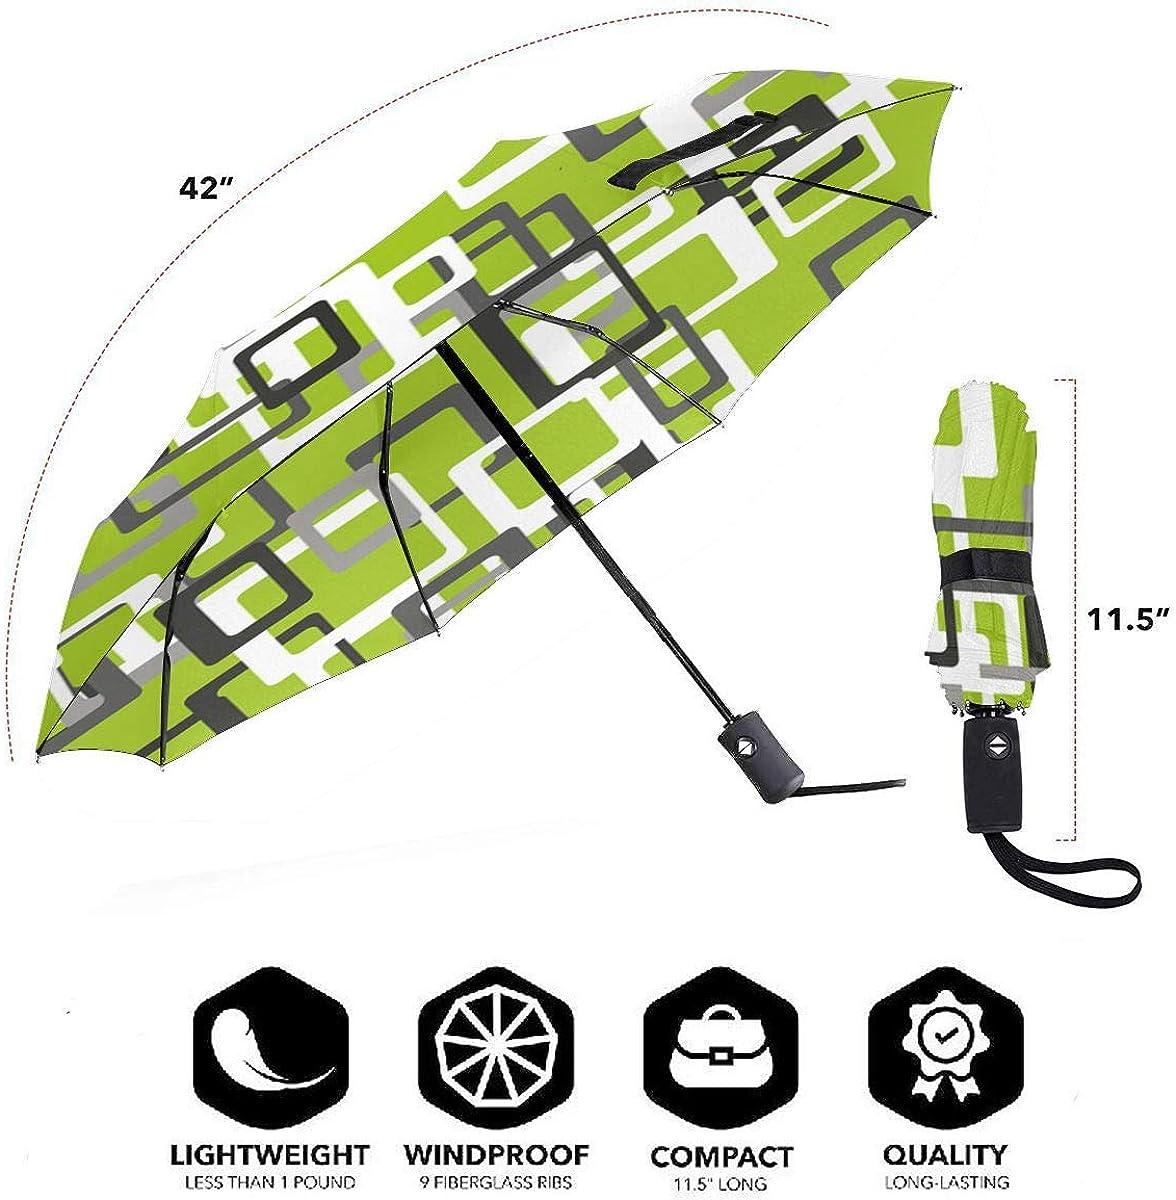 Green Square Corner Square Pattern Compact Travel Umbrella Windproof Reinforced Canopy 8 Ribs Umbrella Auto Open And Close Button Customized